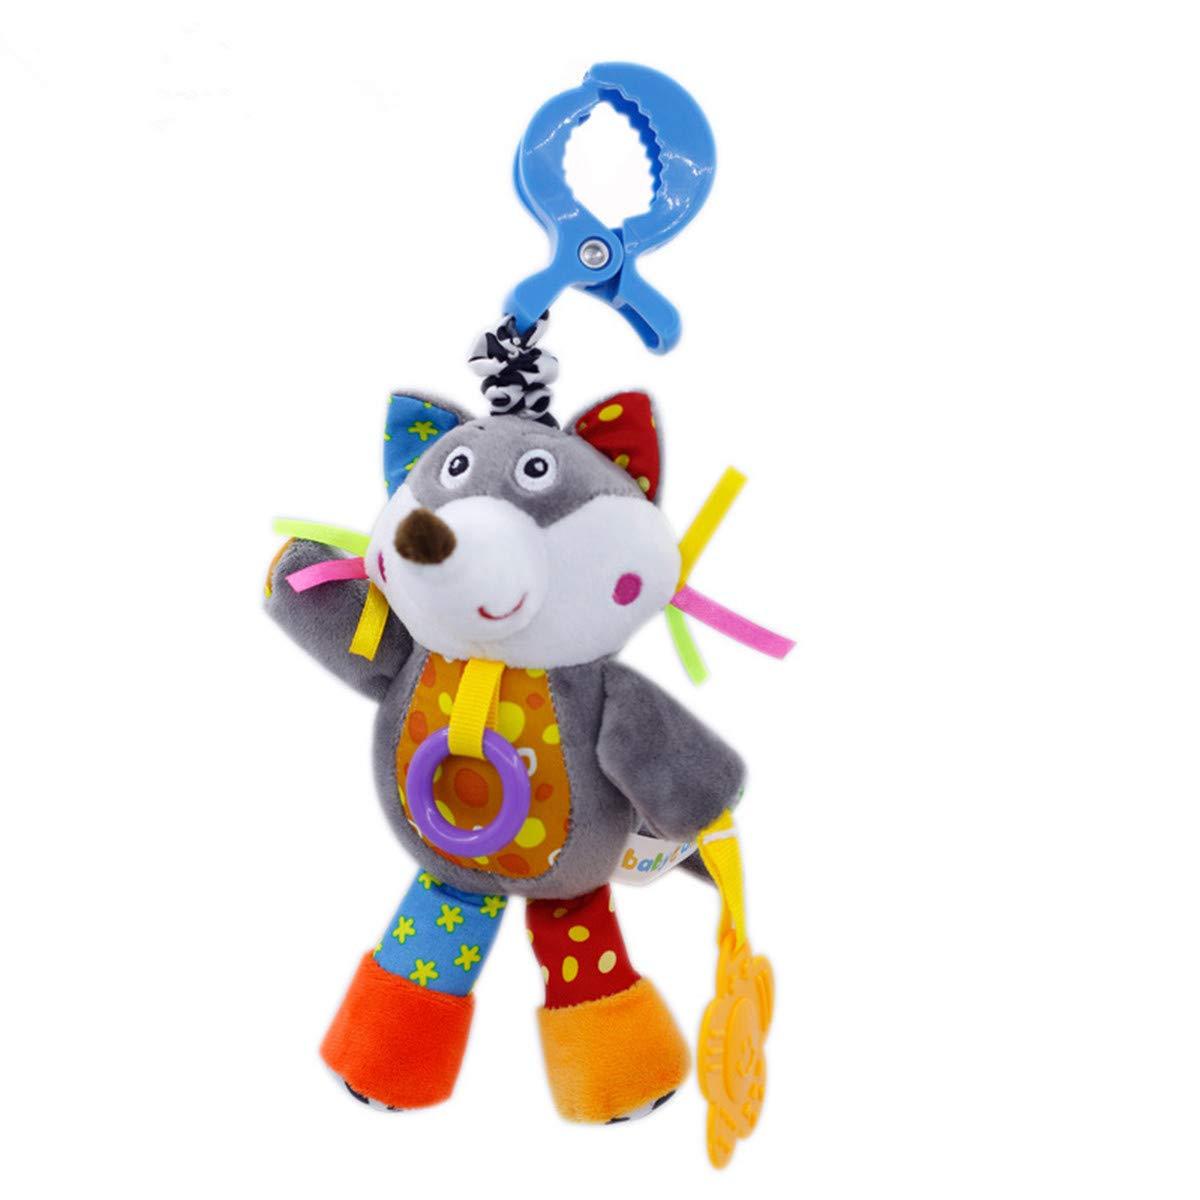 Baby Infant Educational Toys Wolf Plush Animal Kids Car Stroller Hanging Rattles Pram Chew Doll